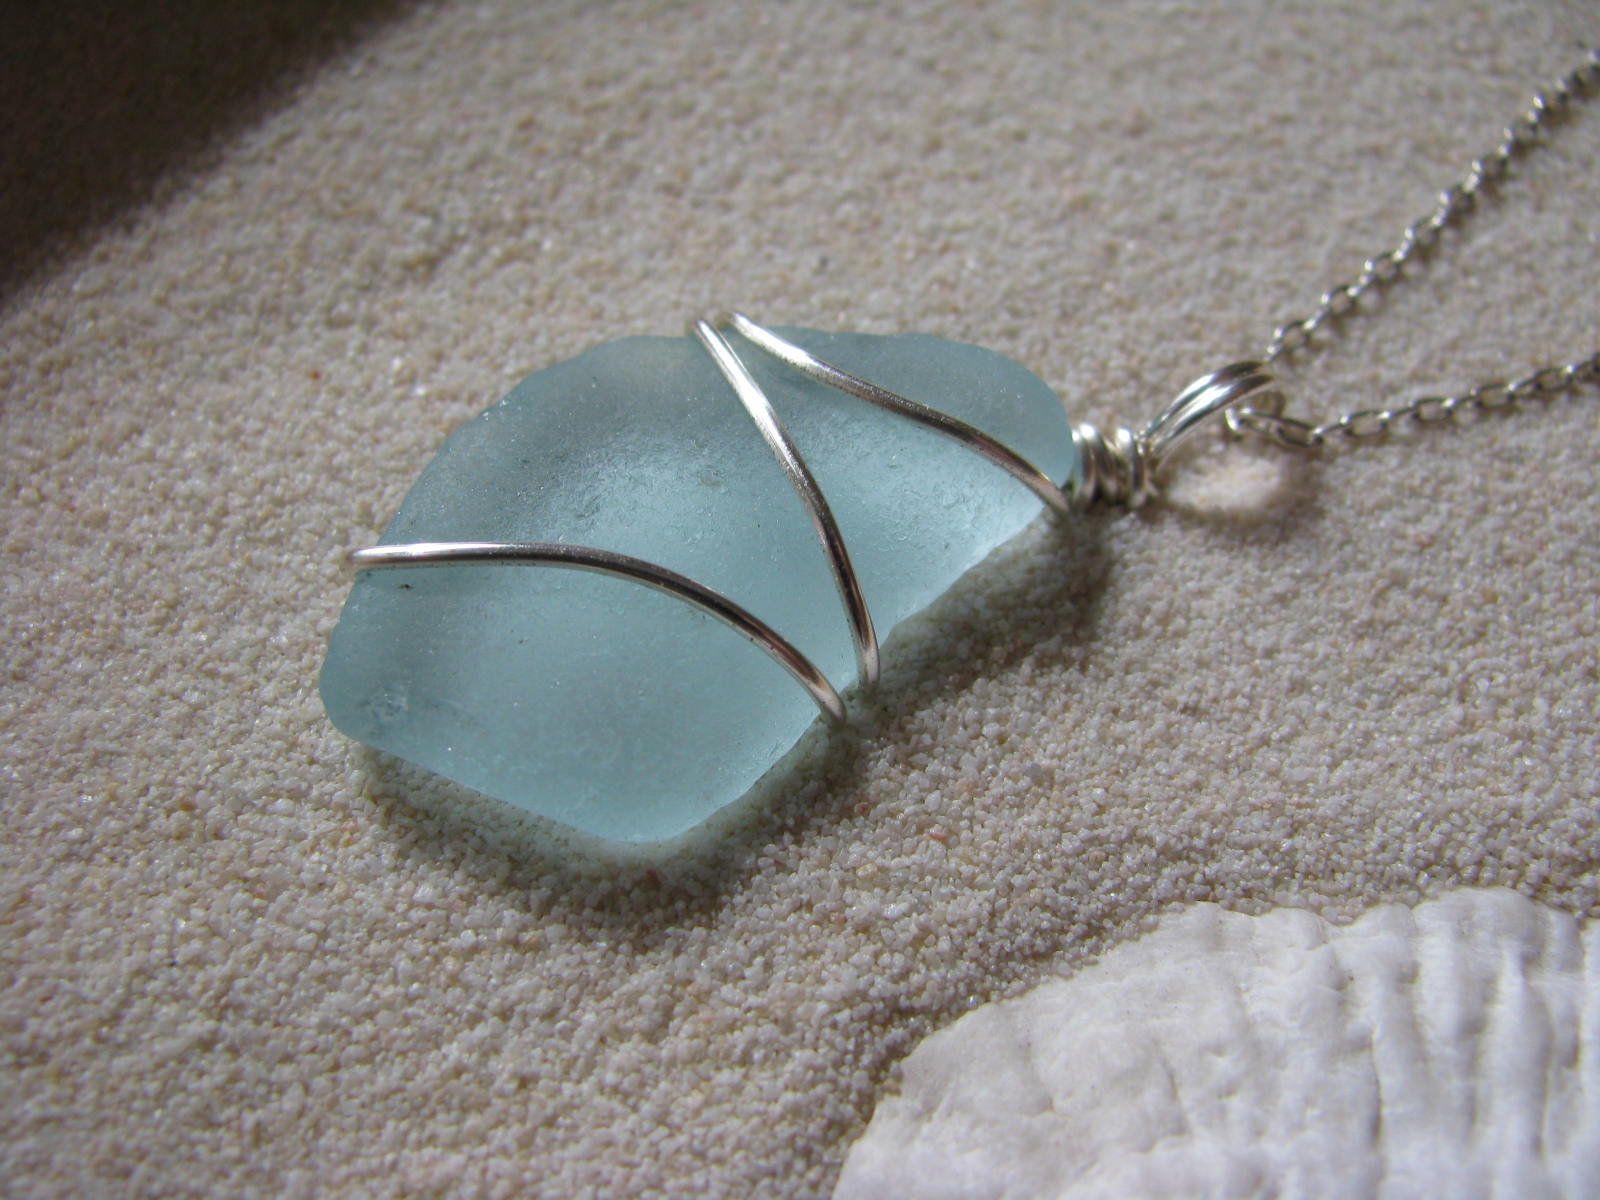 Beach Glass Necklace Beach Glass Jewelry bridesmaid necklace Sea Glass Jewelry beach wedding. Teal Sea Glass Necklace Whale/'s Tail